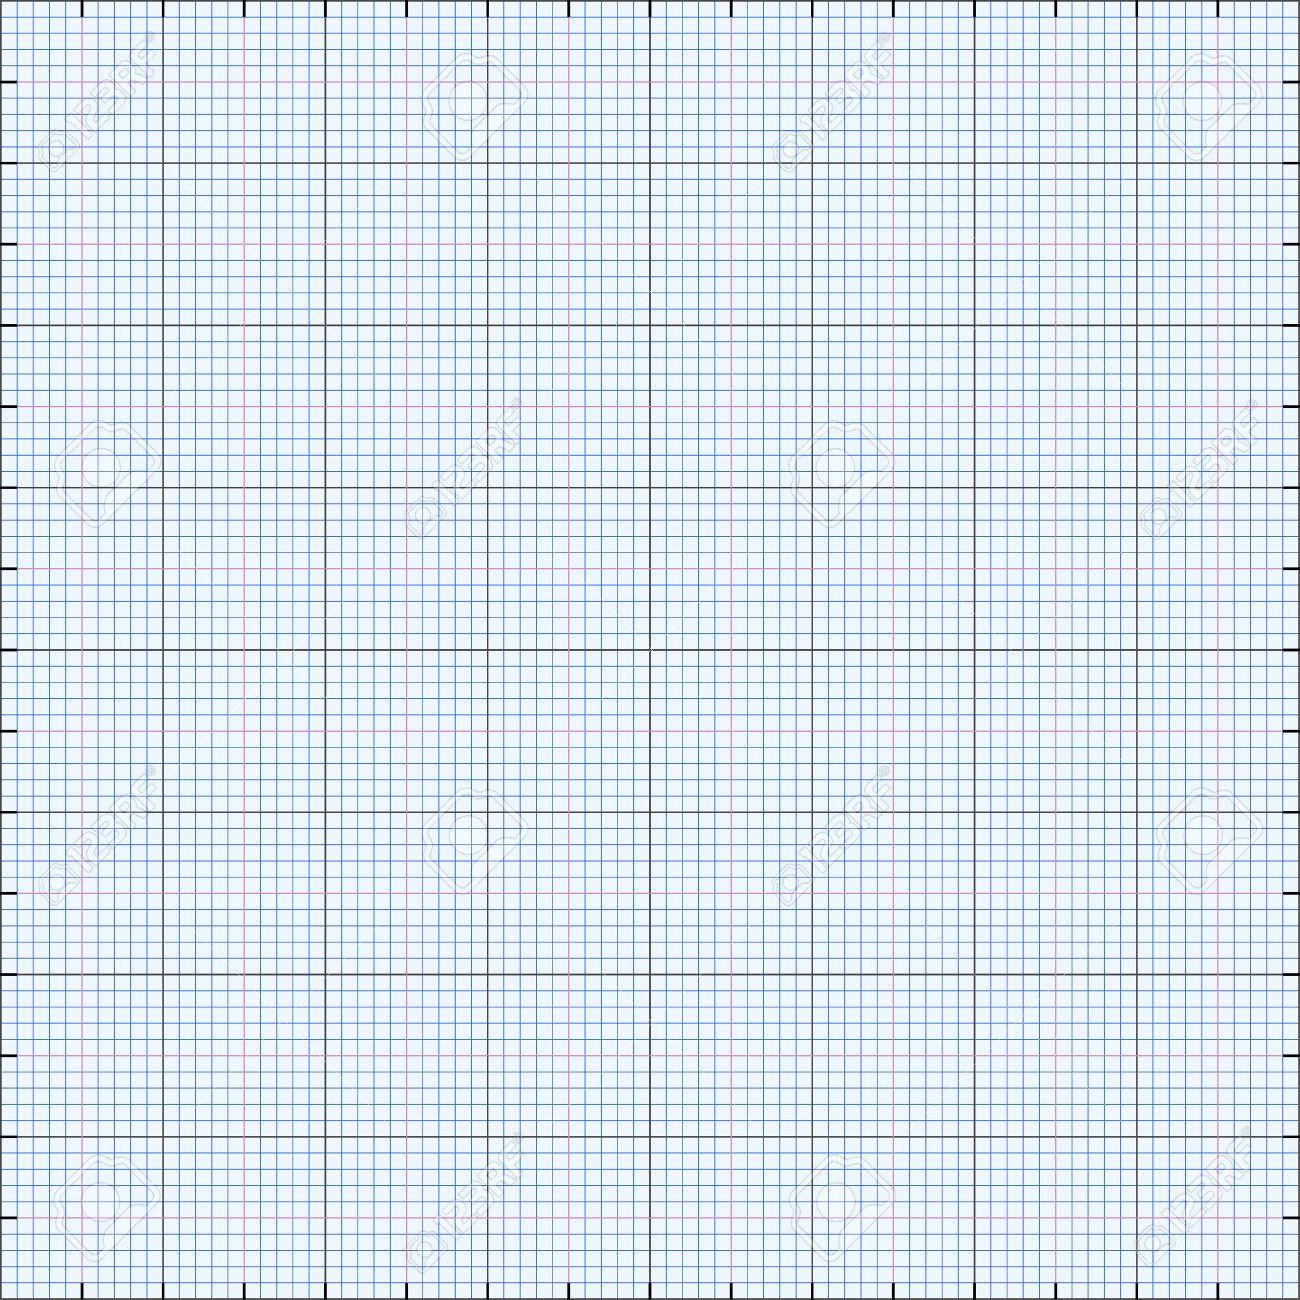 worksheet Graph Paper Grid graph paper grid background blue color 2d illustration vector stock 35951013